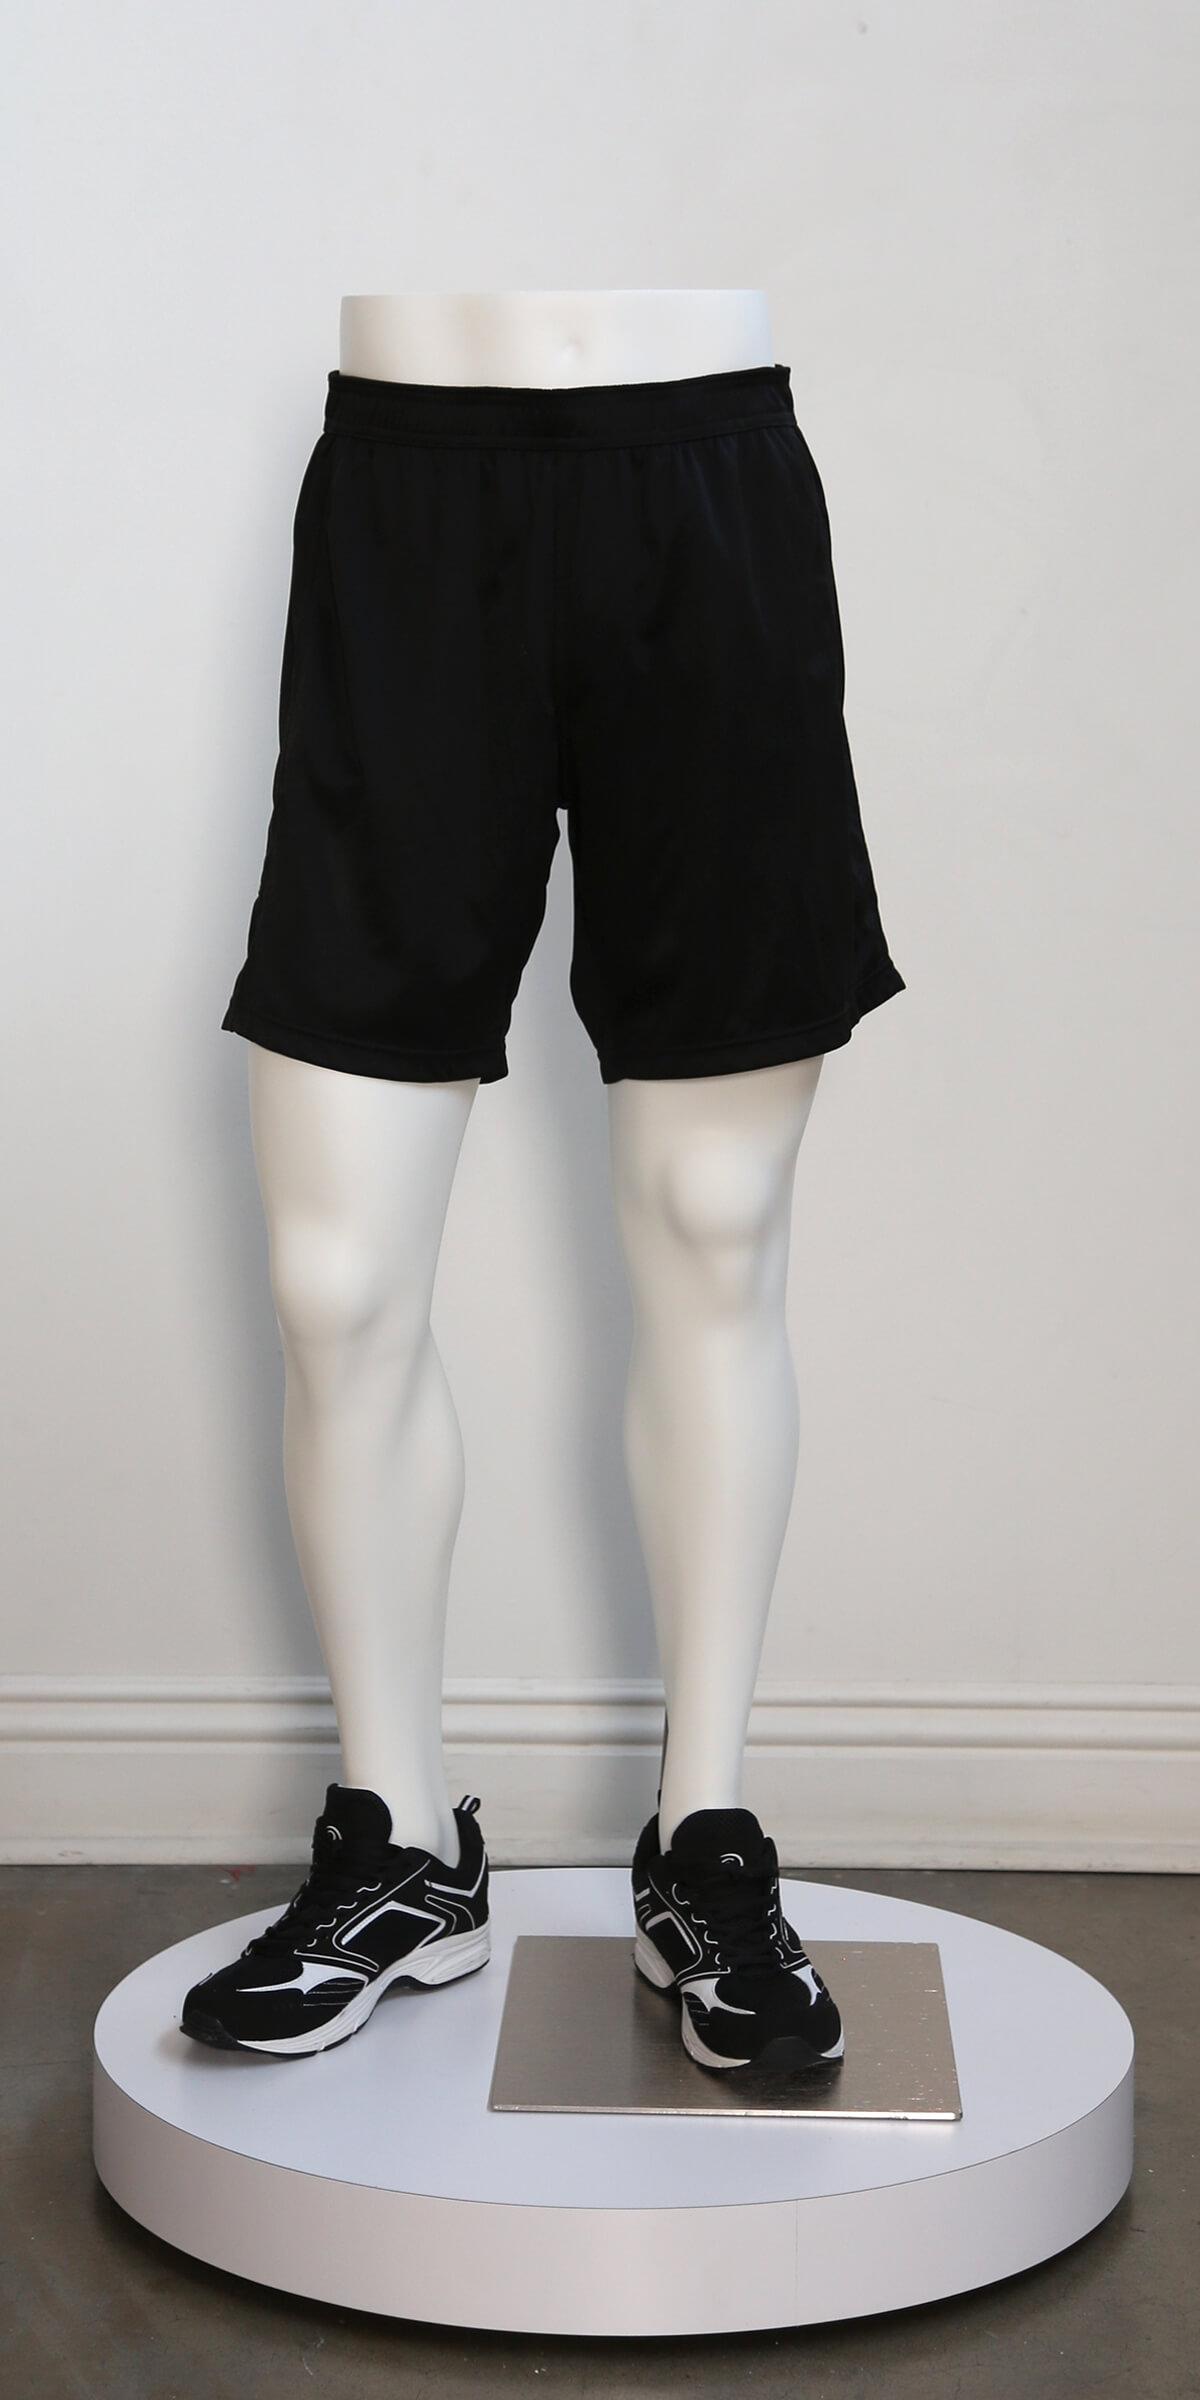 FIT2-M1P-Dressed